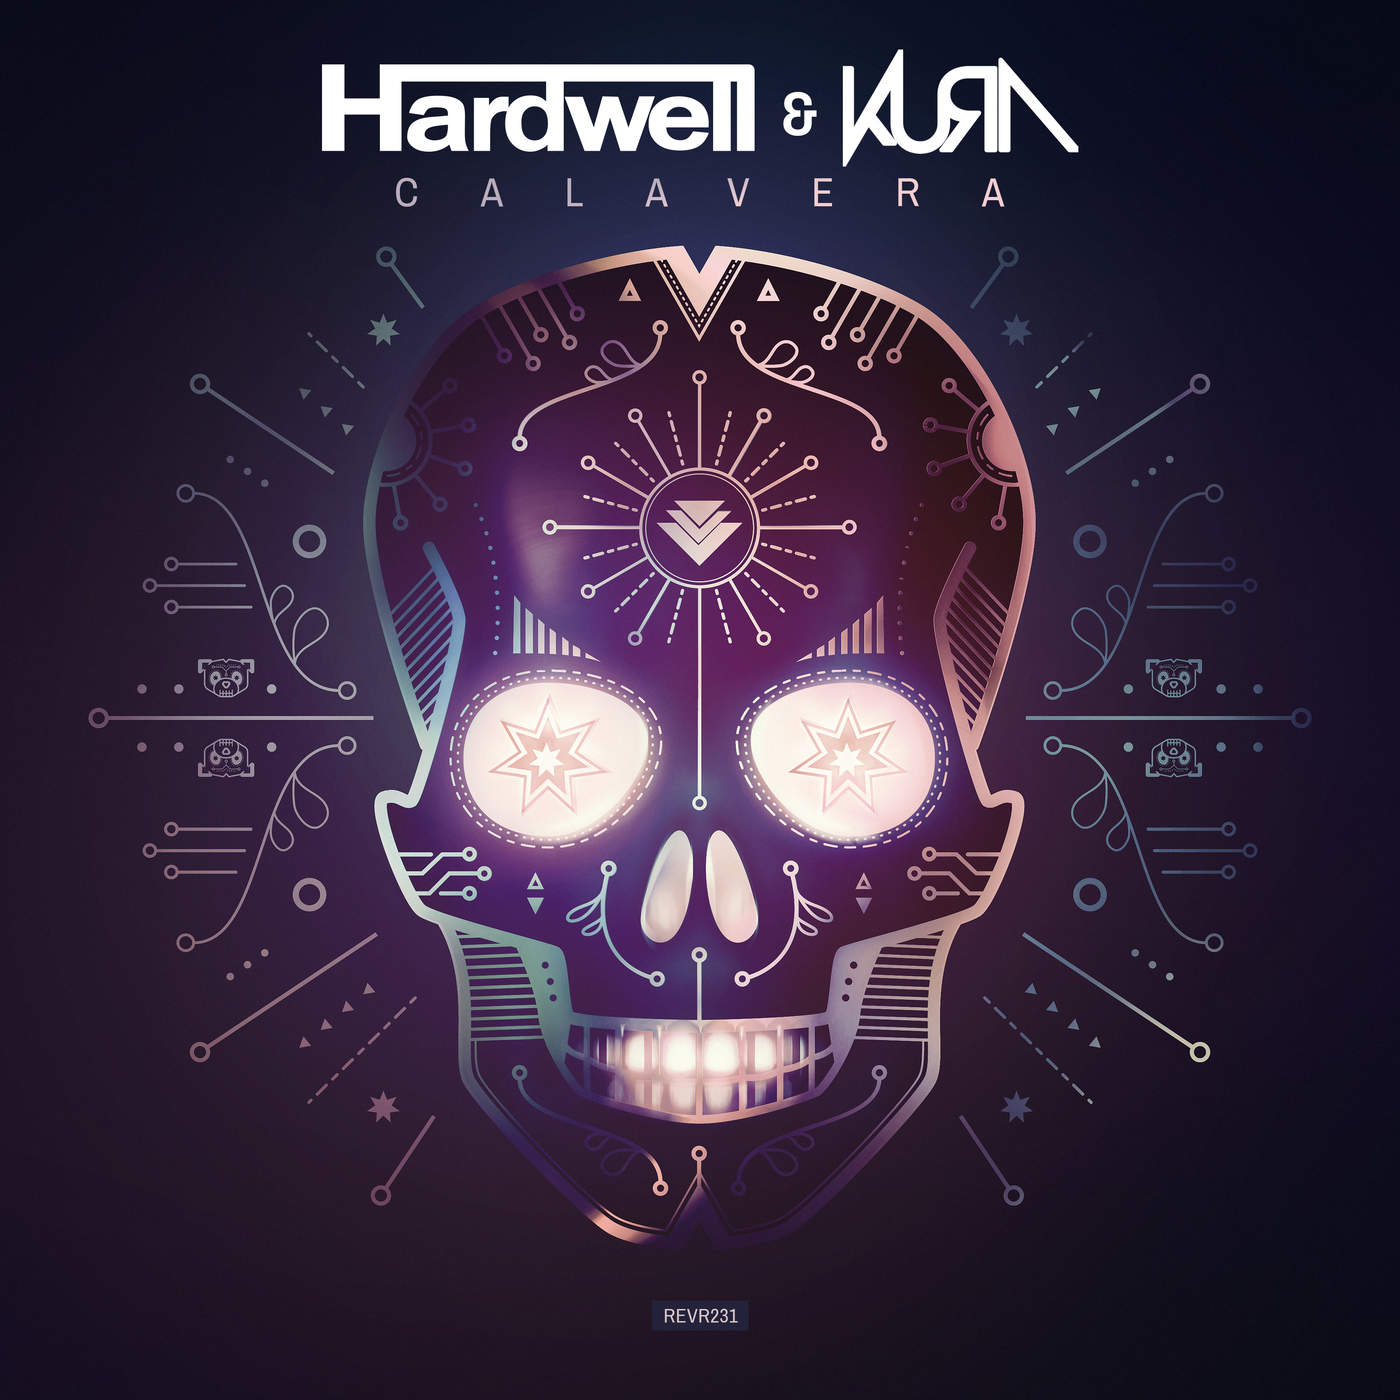 Hardwell & Kúra - Calavera - Single Cover